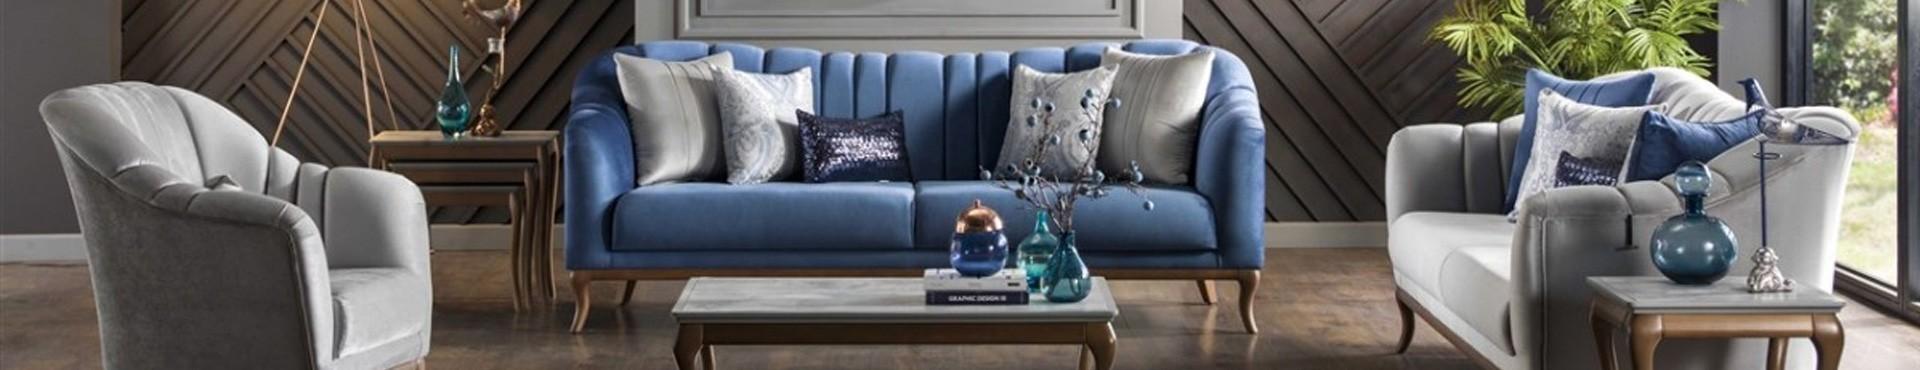 Seturi canapele | Mobila de calitate Bellona